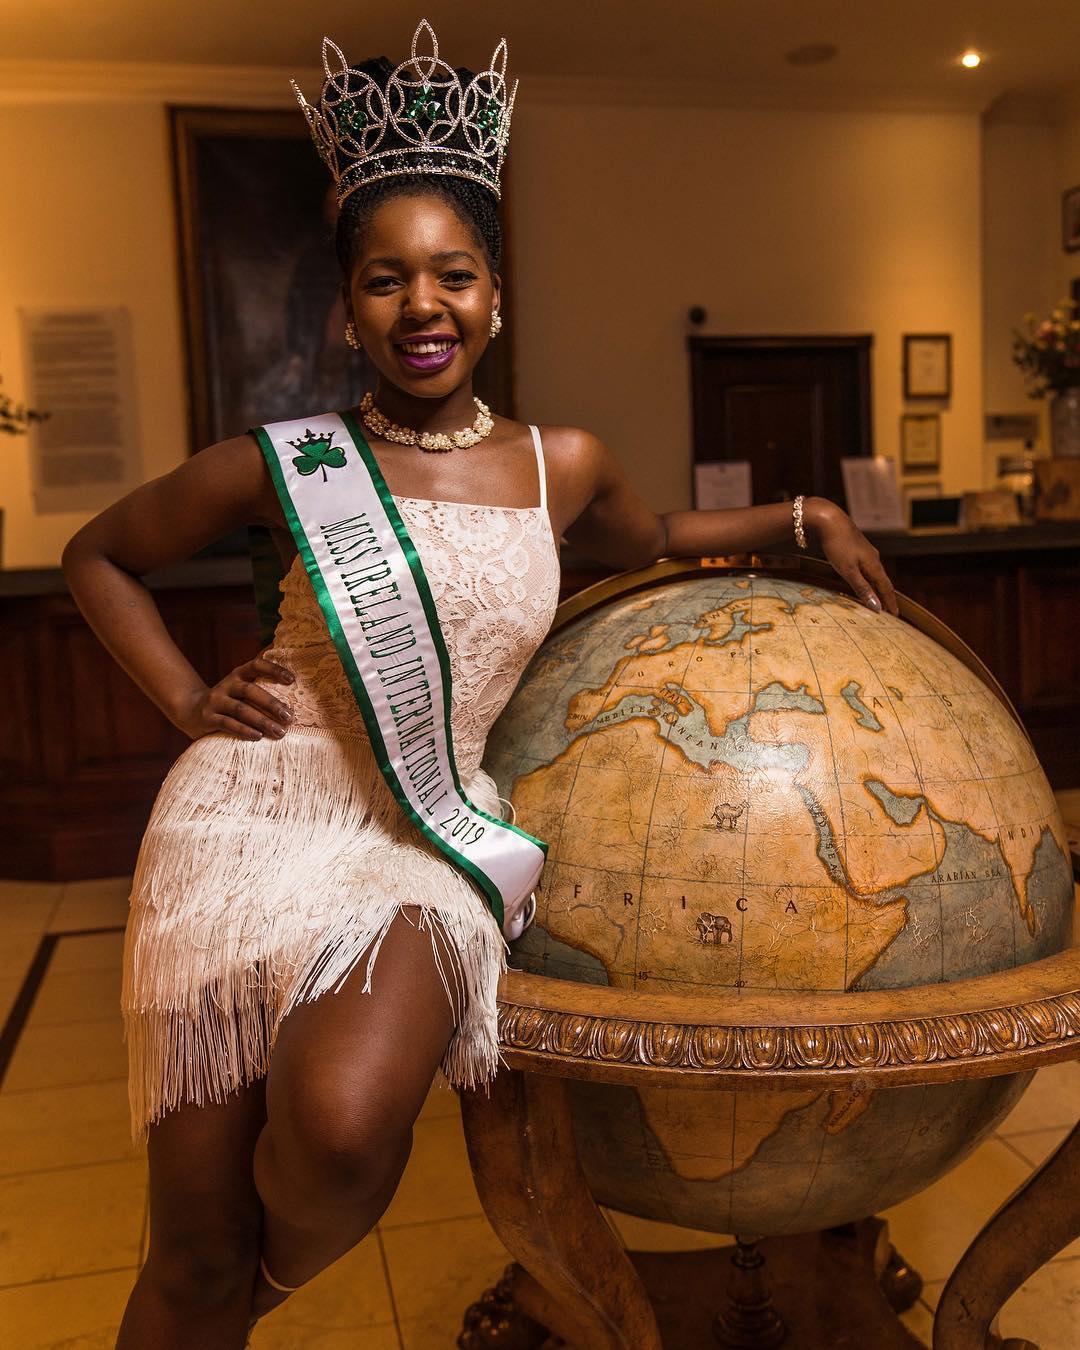 THE PERCH - Miss Ireland International